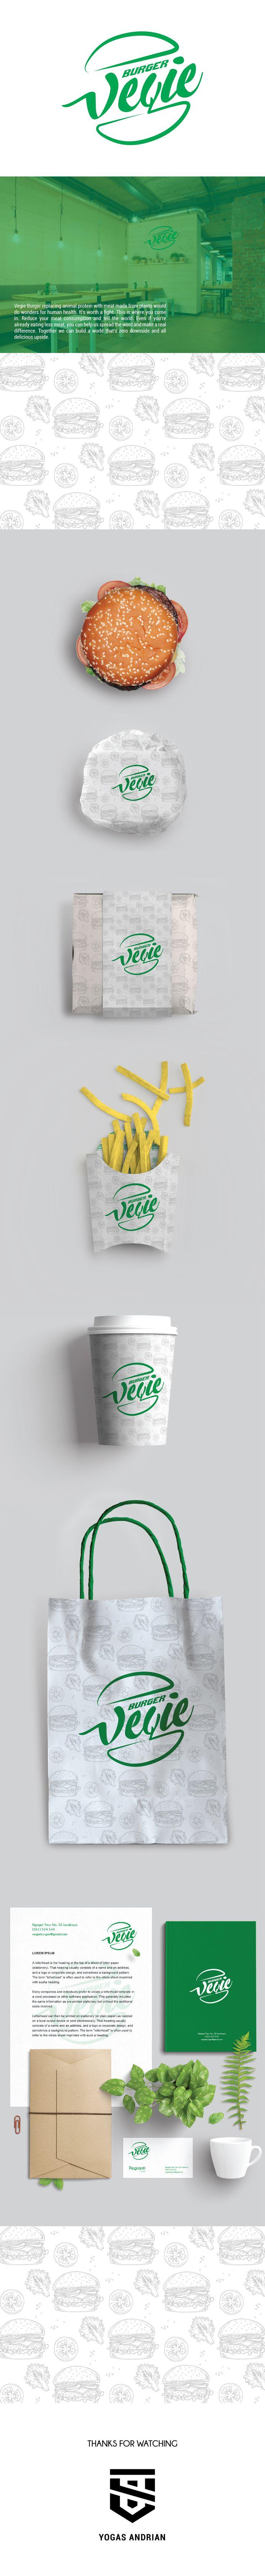 "Check out my @Behance project: ""Vegie Burger Branding Identity"" https://www.behance.net/gallery/58537679/Vegie-Burger-Branding-Identity"